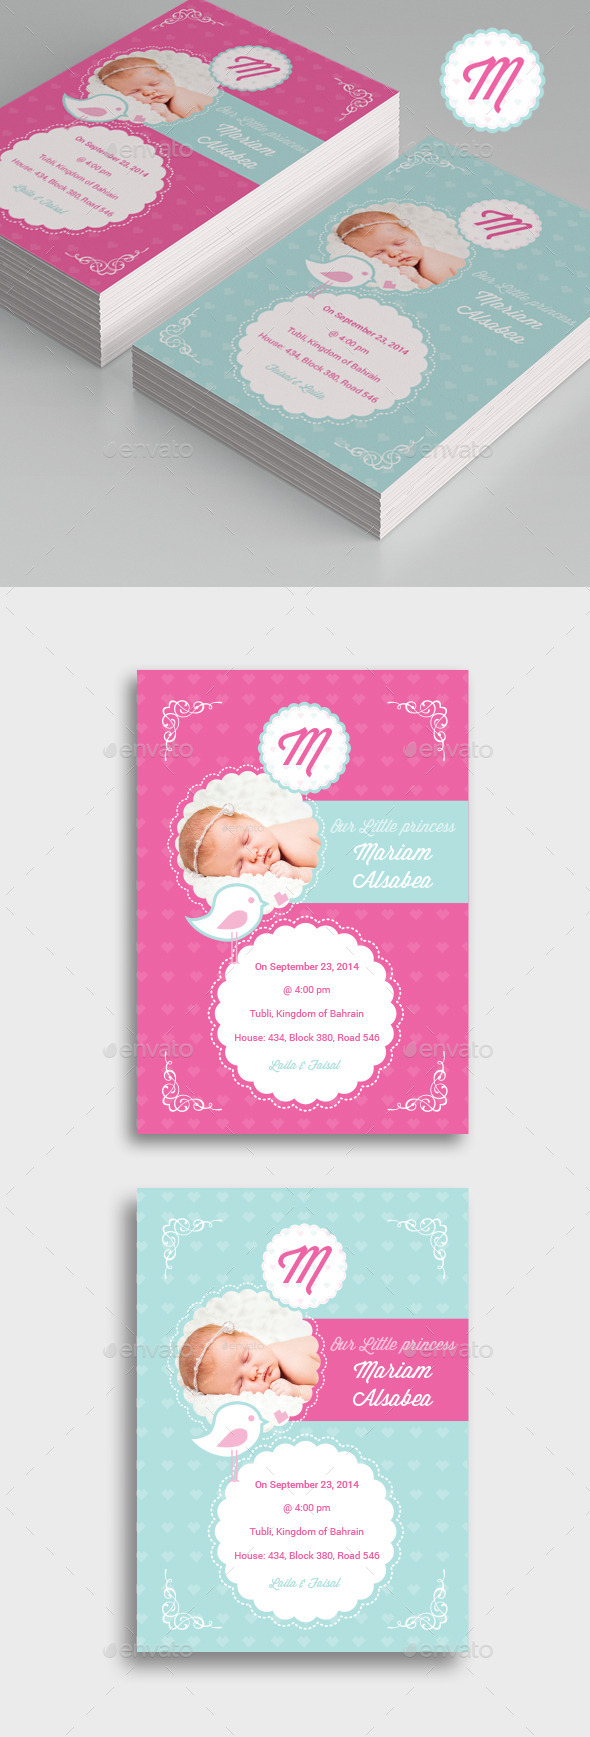 Bird Baby Girl Flyer - Family Cards & Invites